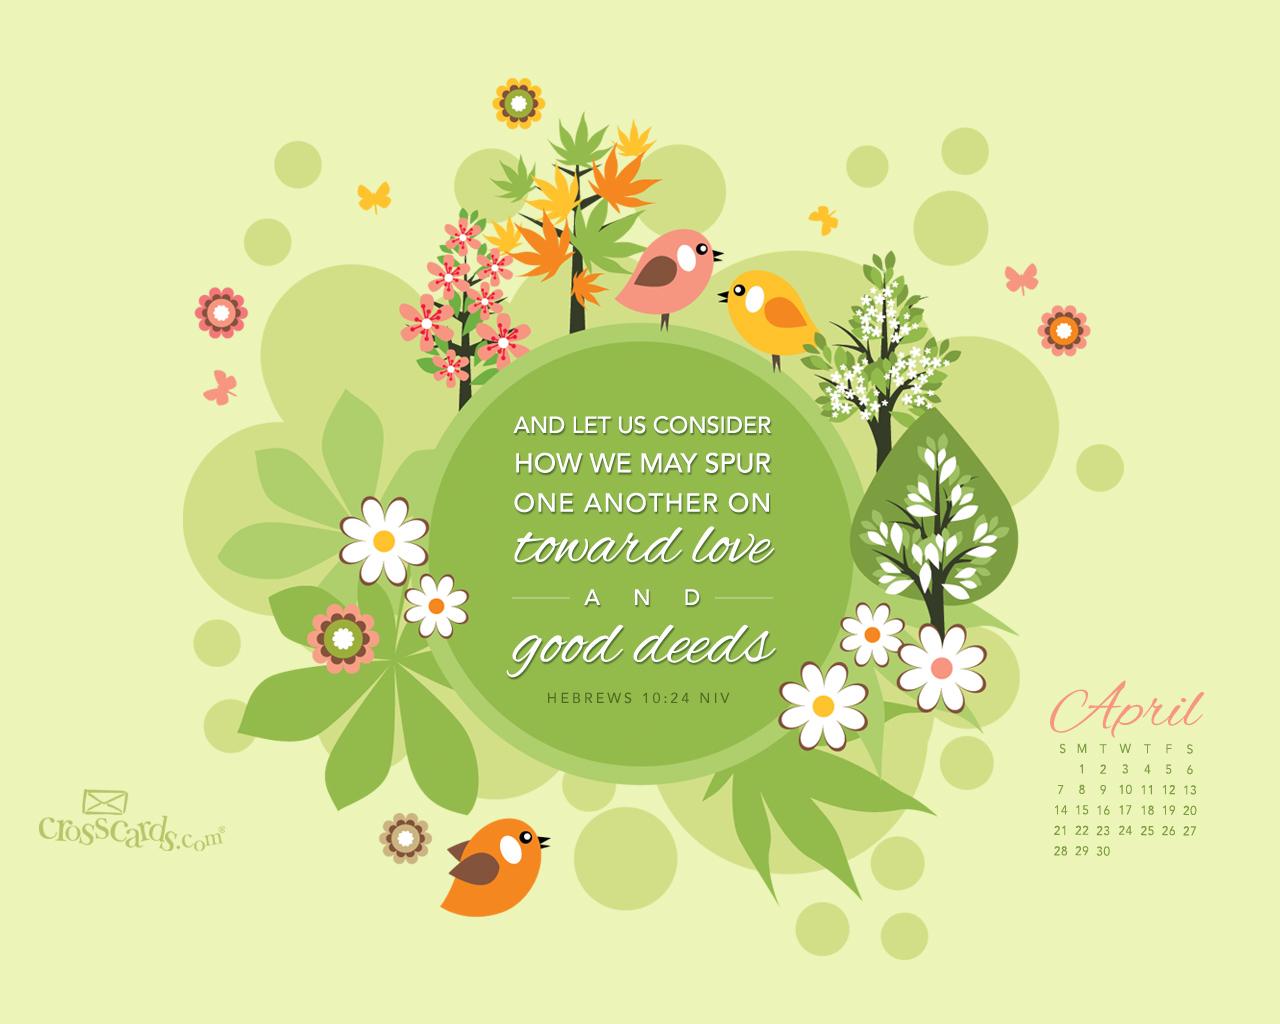 Christian Wallpaper Calendar : Free christian wallpapers april desktop